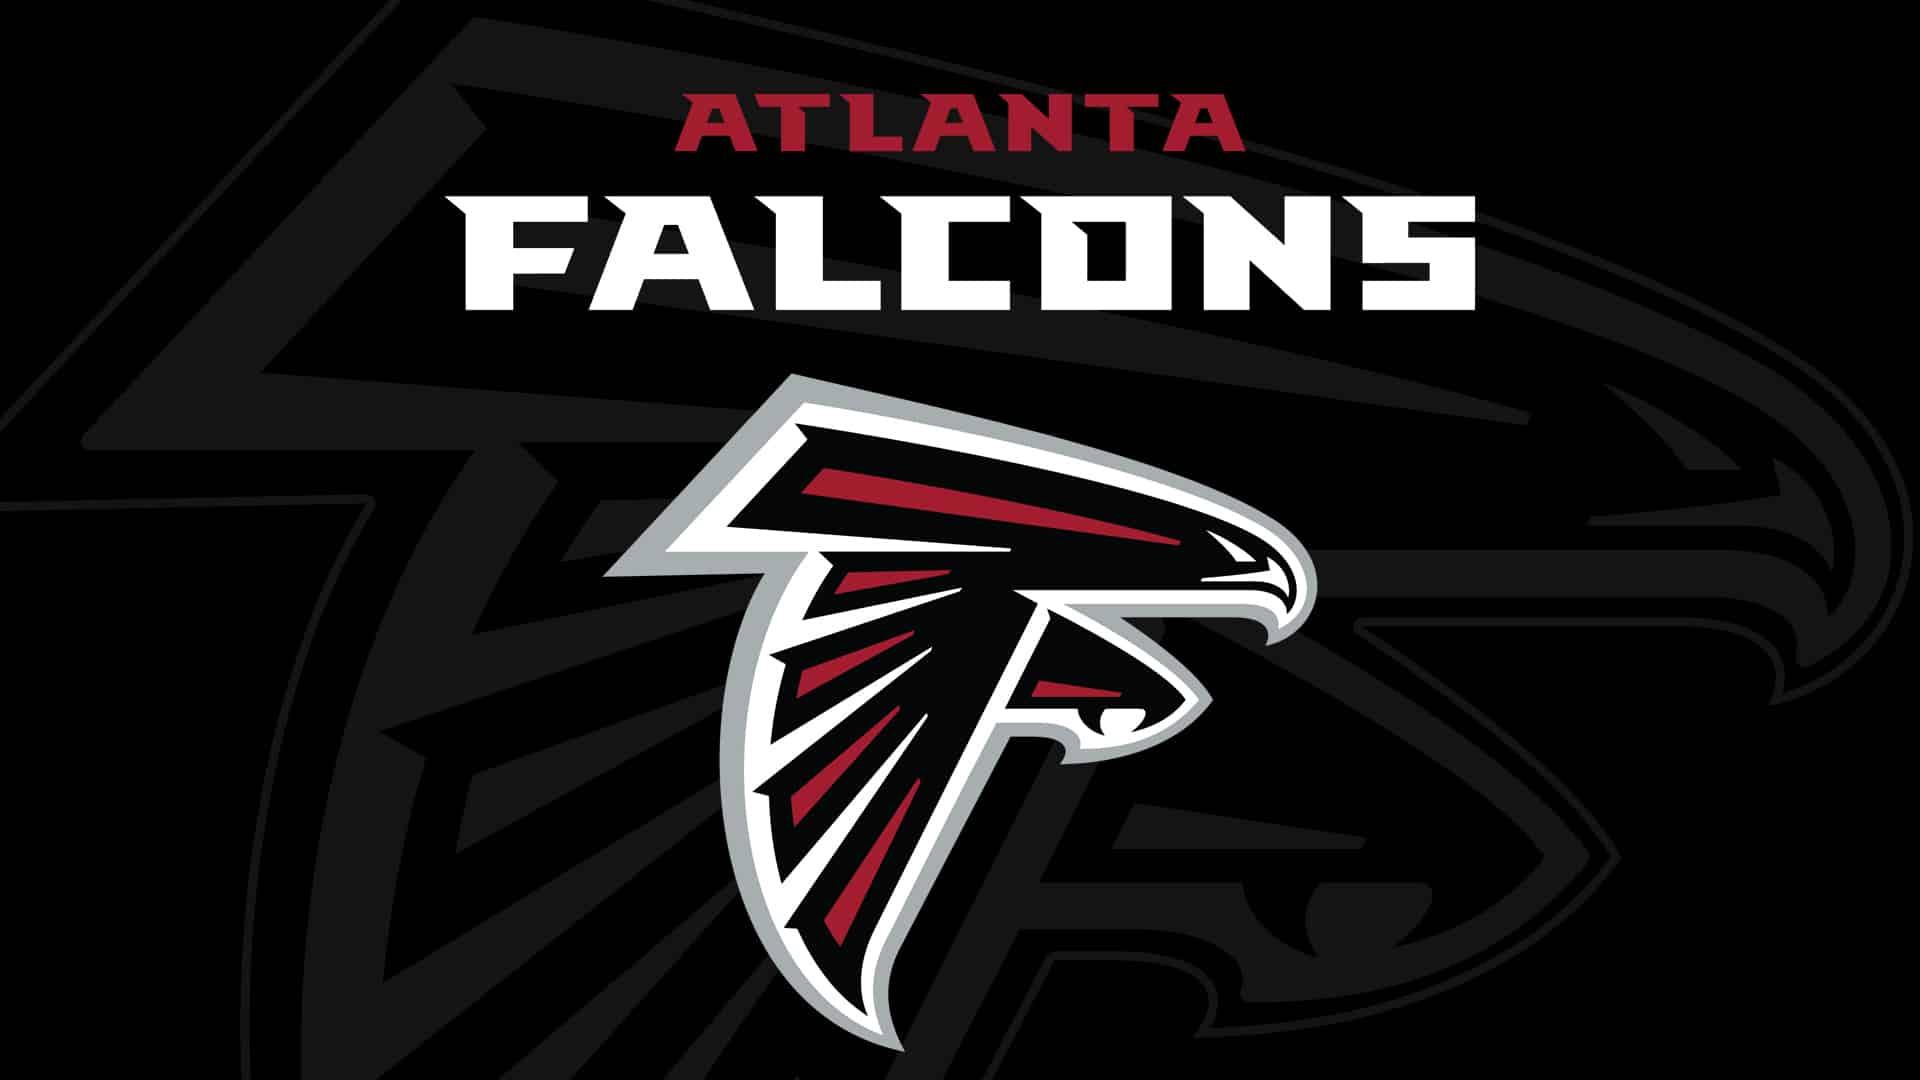 Predstavljanje timova za novu sezonu - Atlanta Falkonsi - Sportske novosti